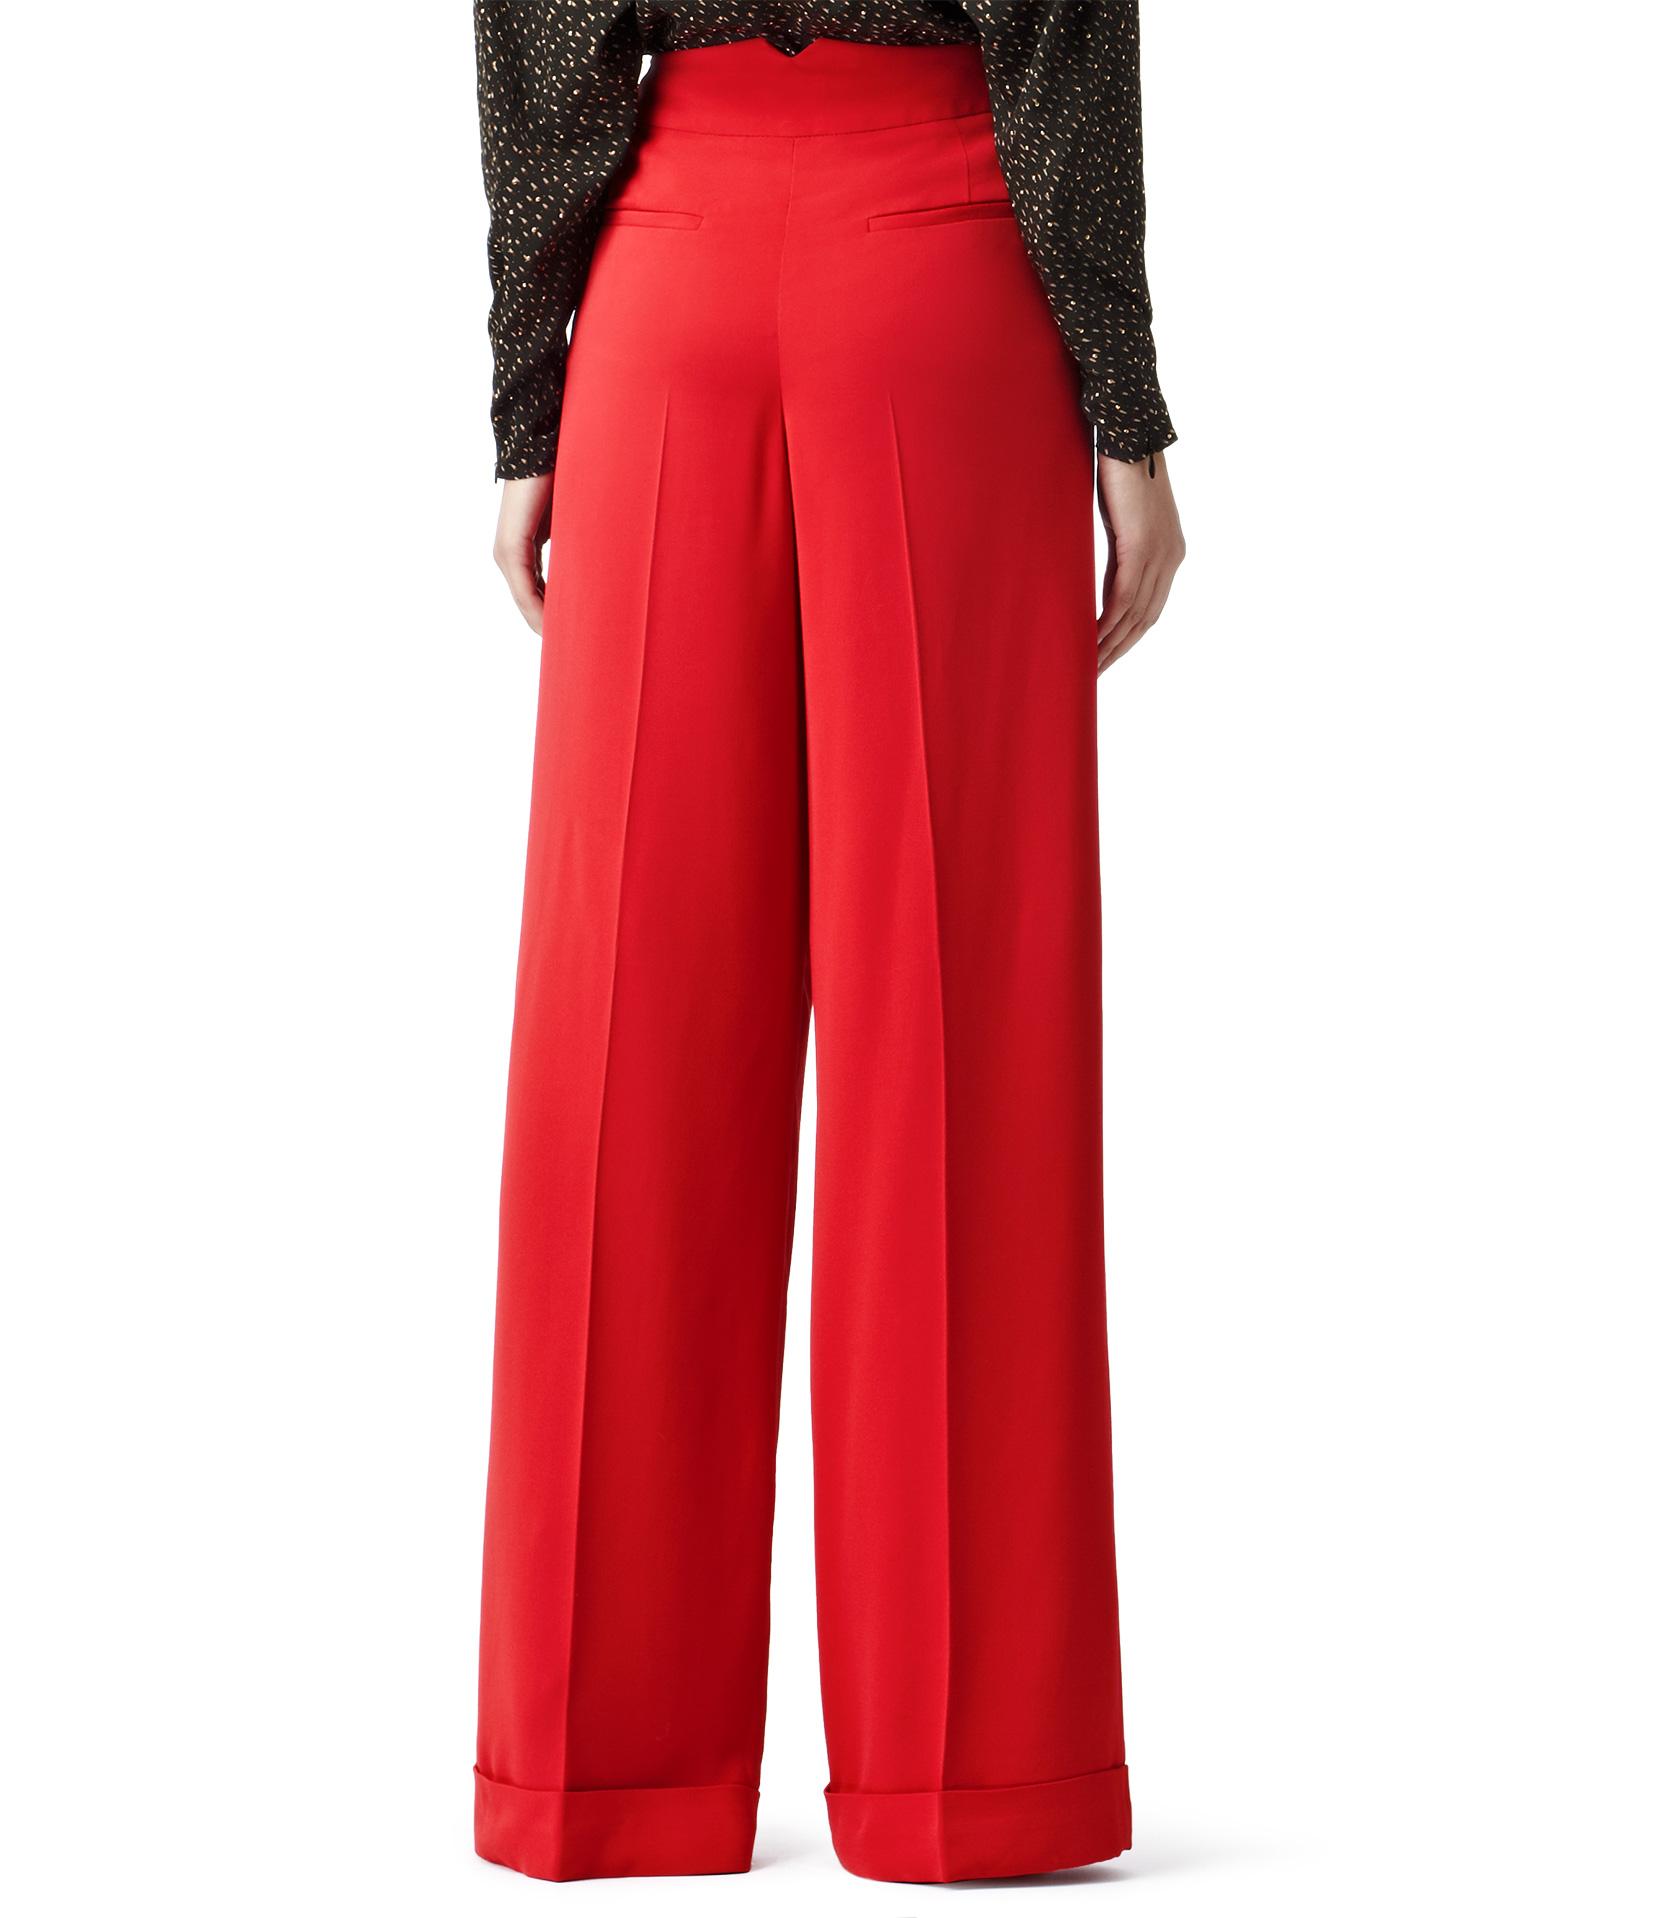 Reiss Daria Wide Leg Trousers in Red | Lyst